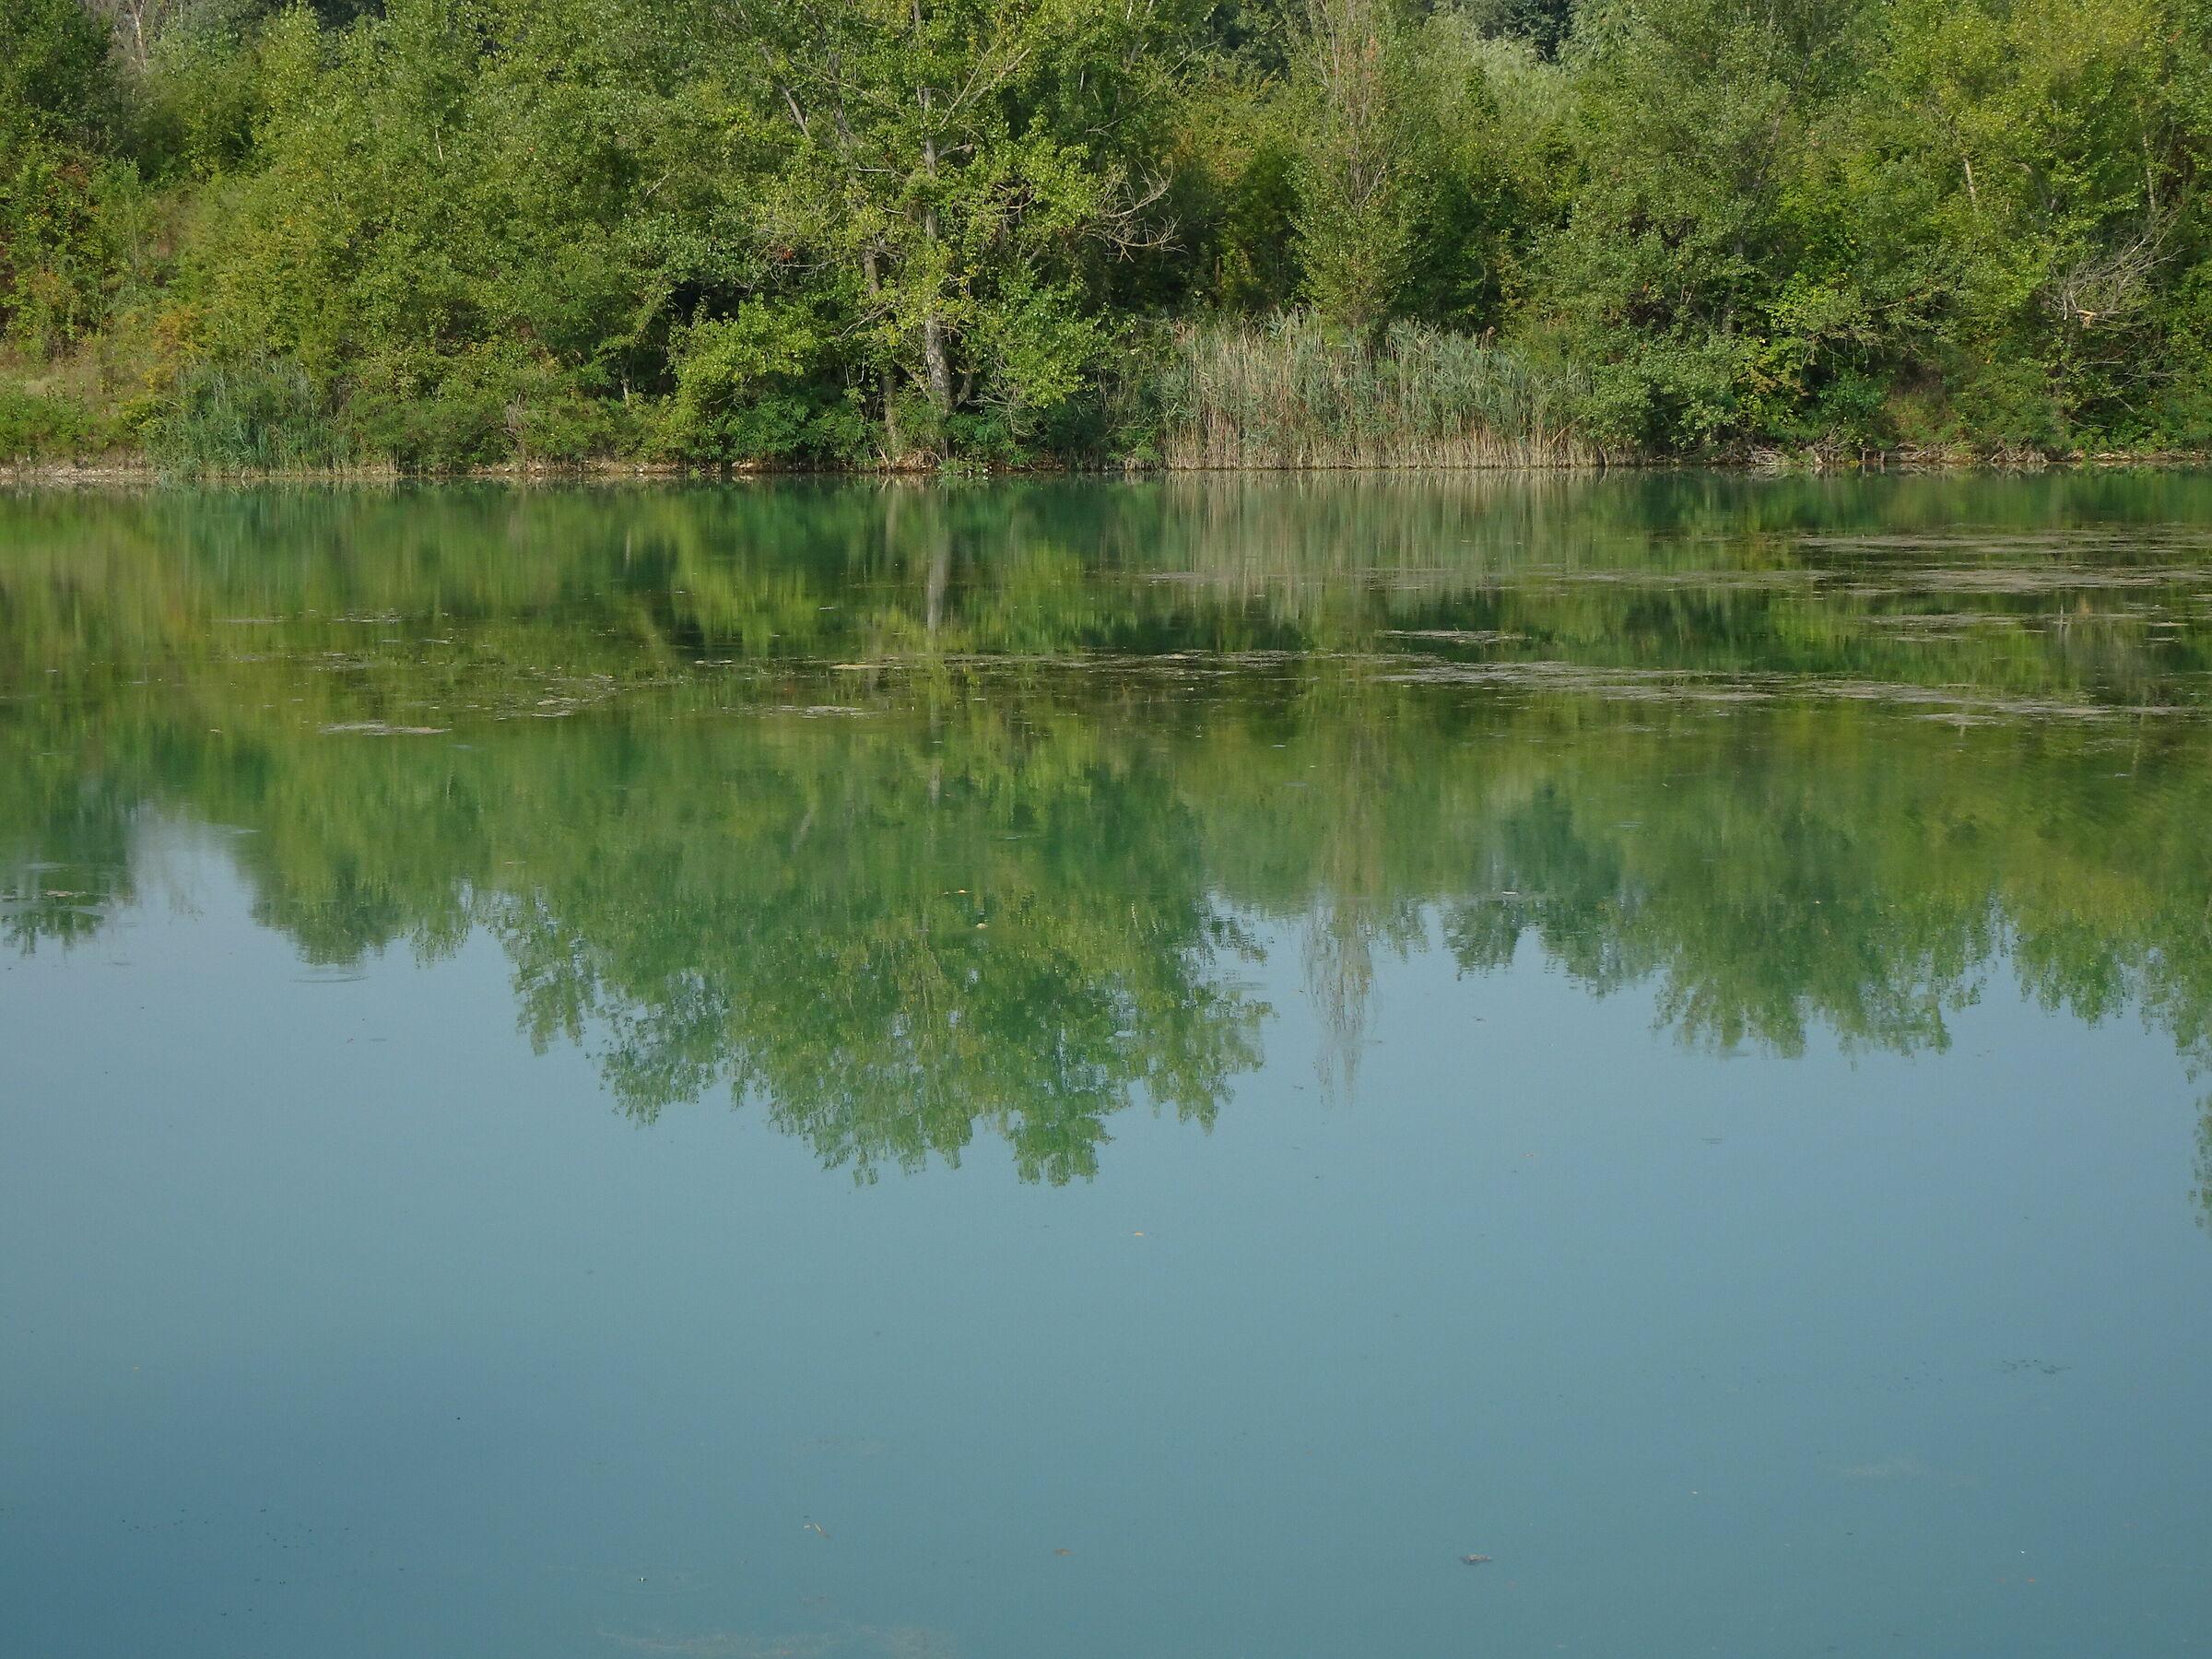 Lakes of S. Anna - S. Cesario on the Panaro (MO) 3...